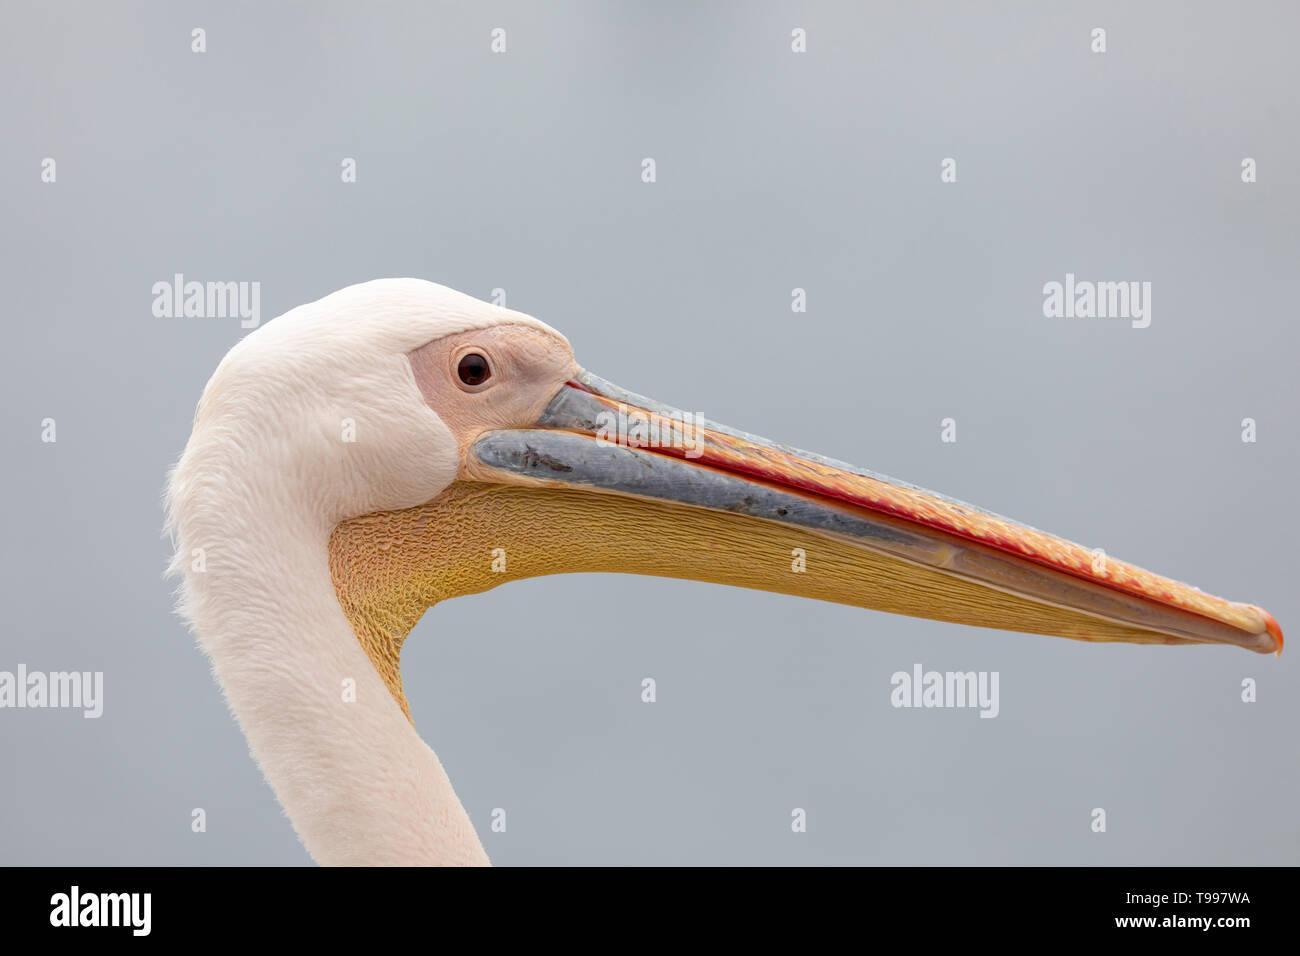 Great White Pelican (Pelecanus onocrotalus) - Stock Image